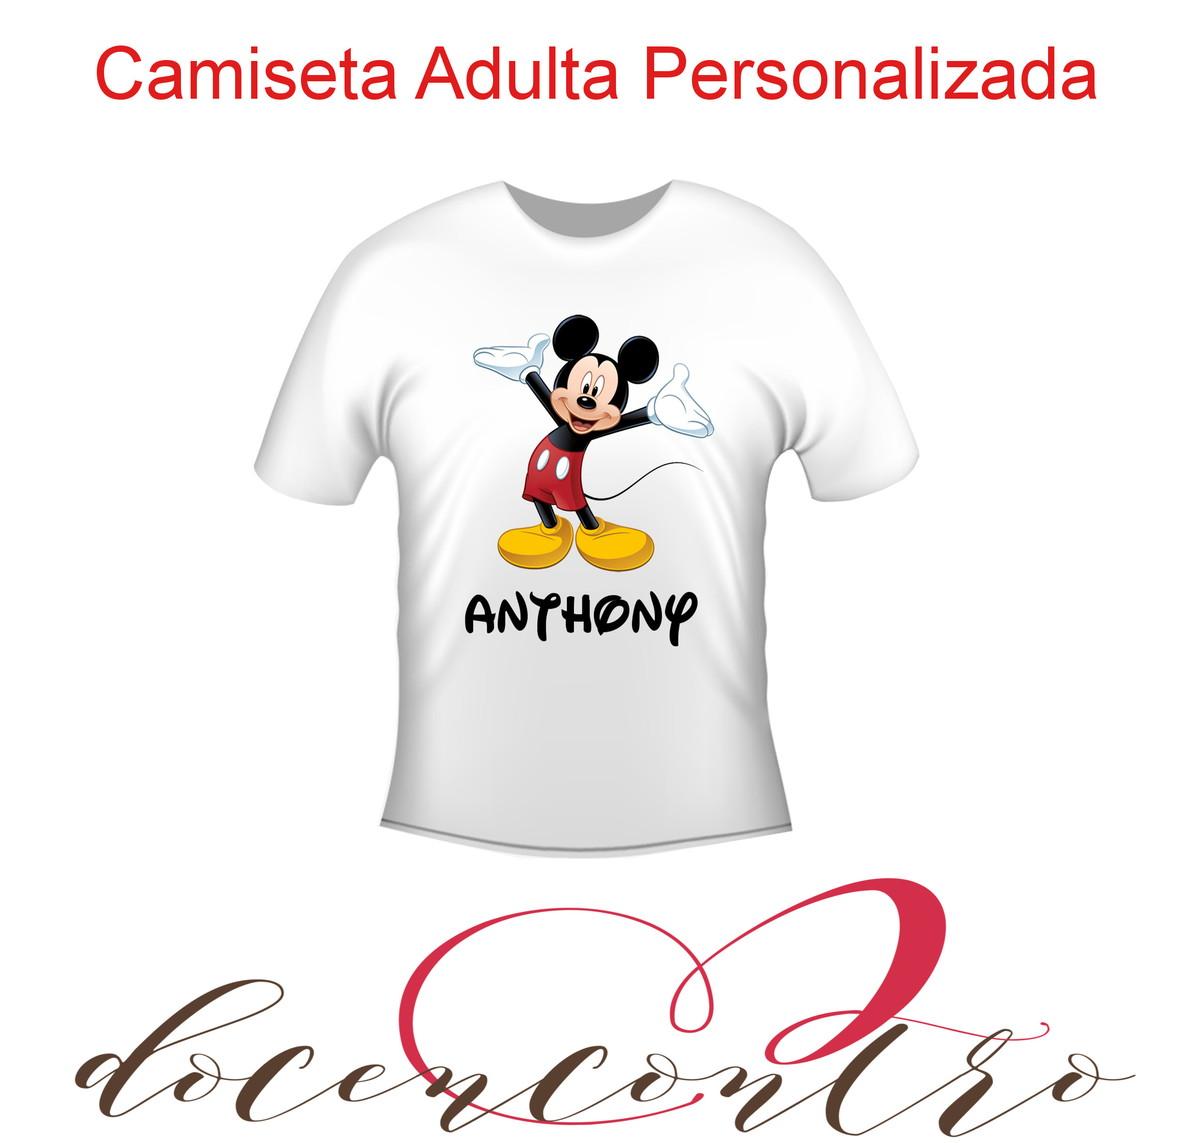 b45458067f Camiseta adulto personalizada no Elo7